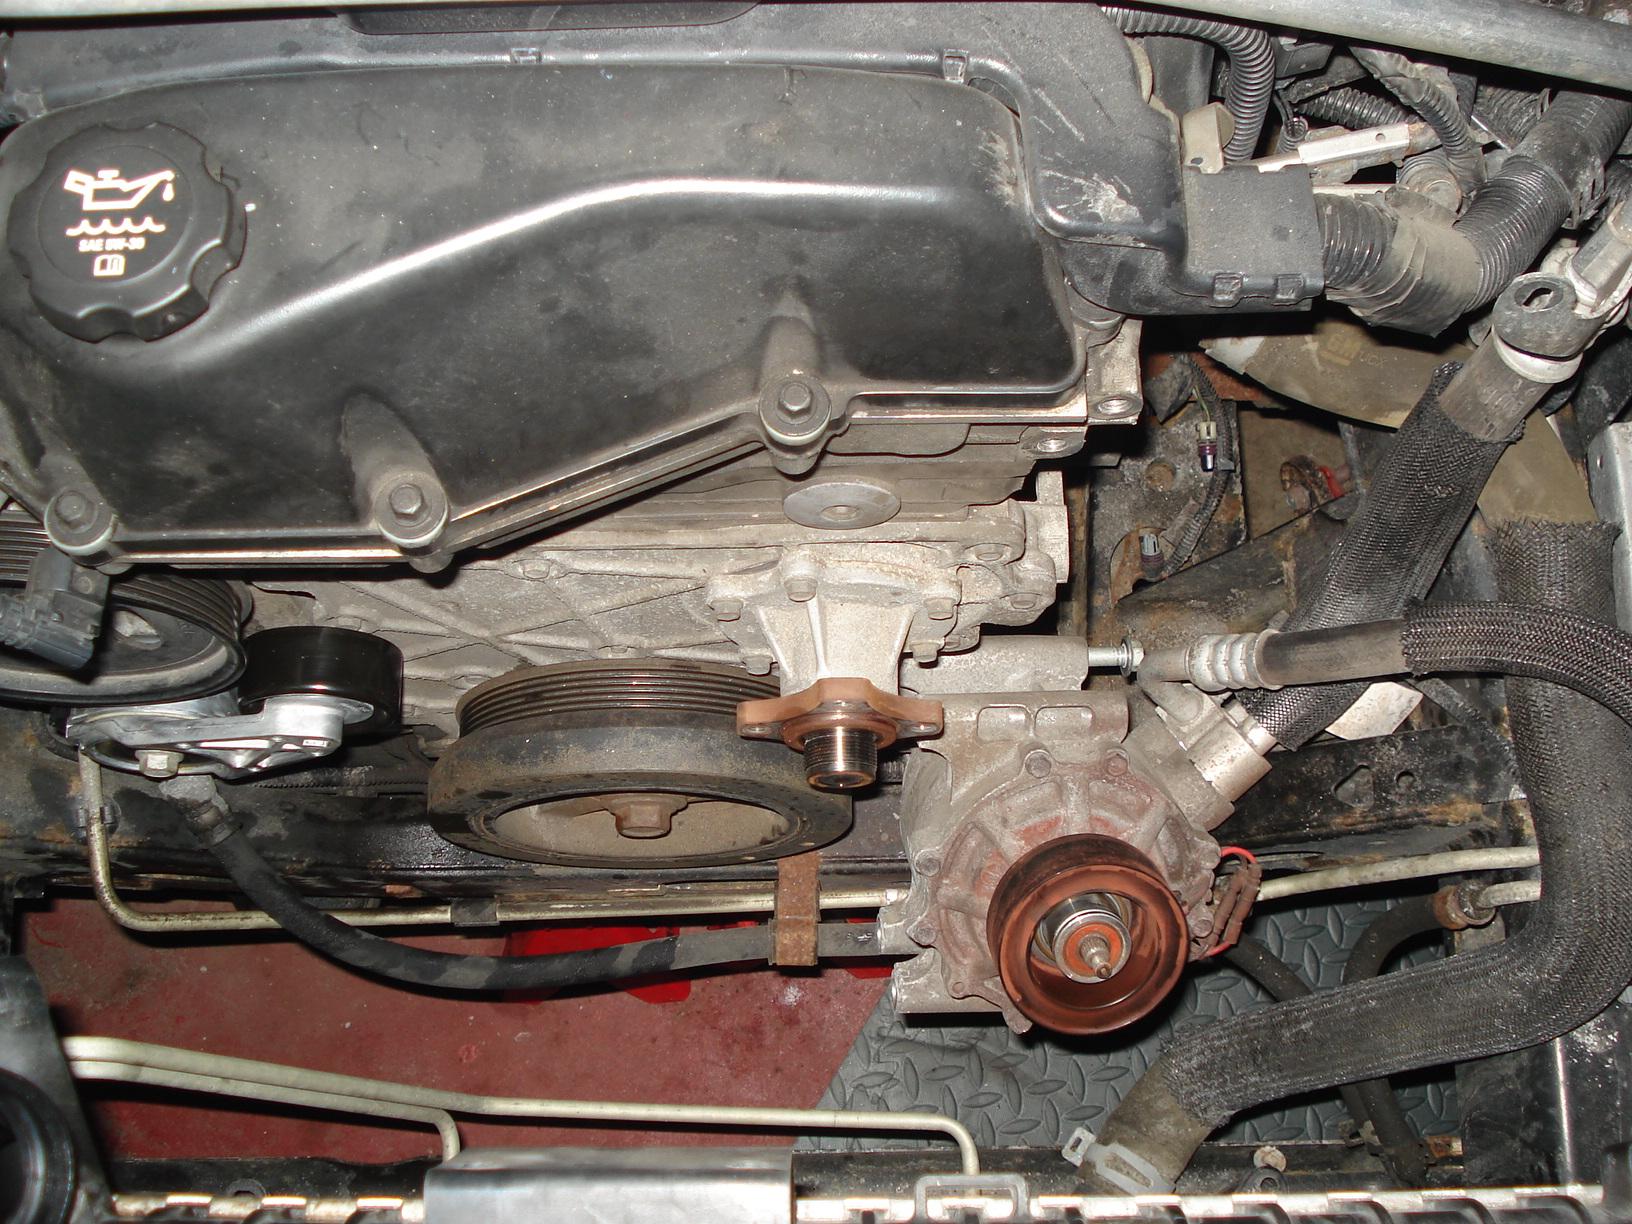 Interior 52576052 besides Watch in addition 160 Test Bench Wiring Basic Wiring To Start furthermore Chevy Venture Power Window Wiring Diagram also 1991 Chevrolet Zr2 S10 Fuse Box Diagram. on 2003 trailblazer fuse box location